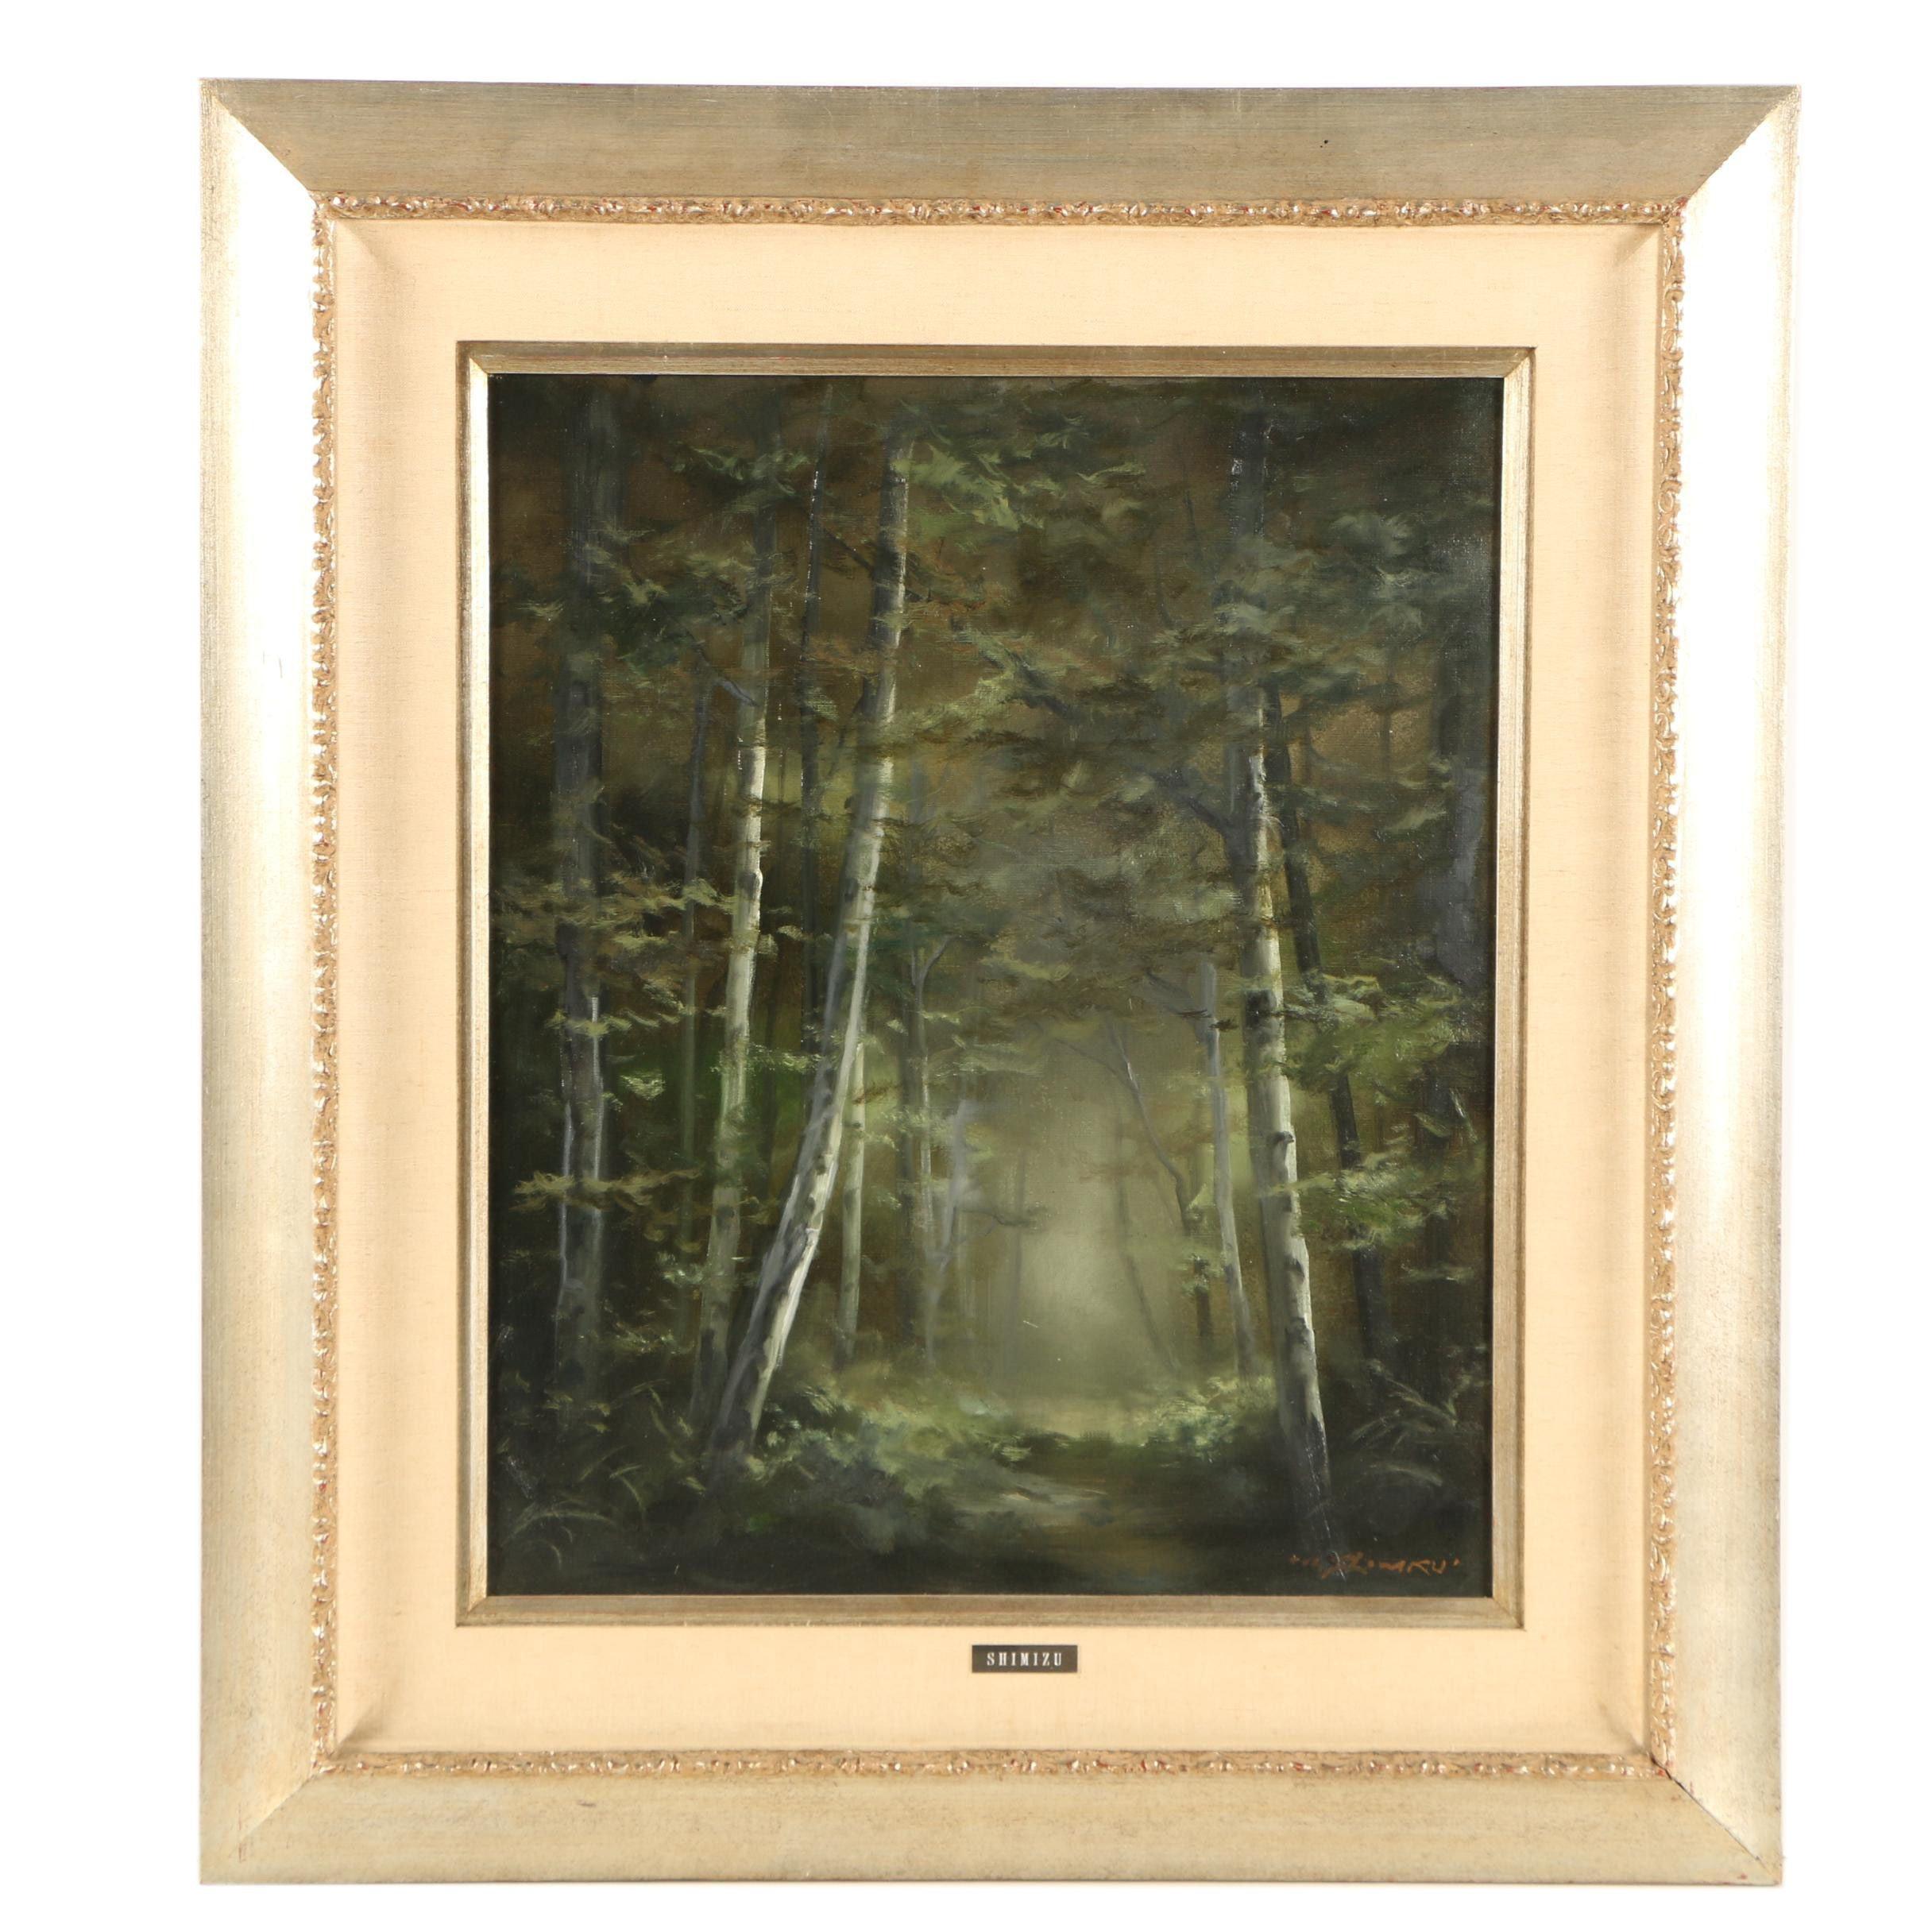 Mitsuzo Shimizu Oil Painting on Canvas